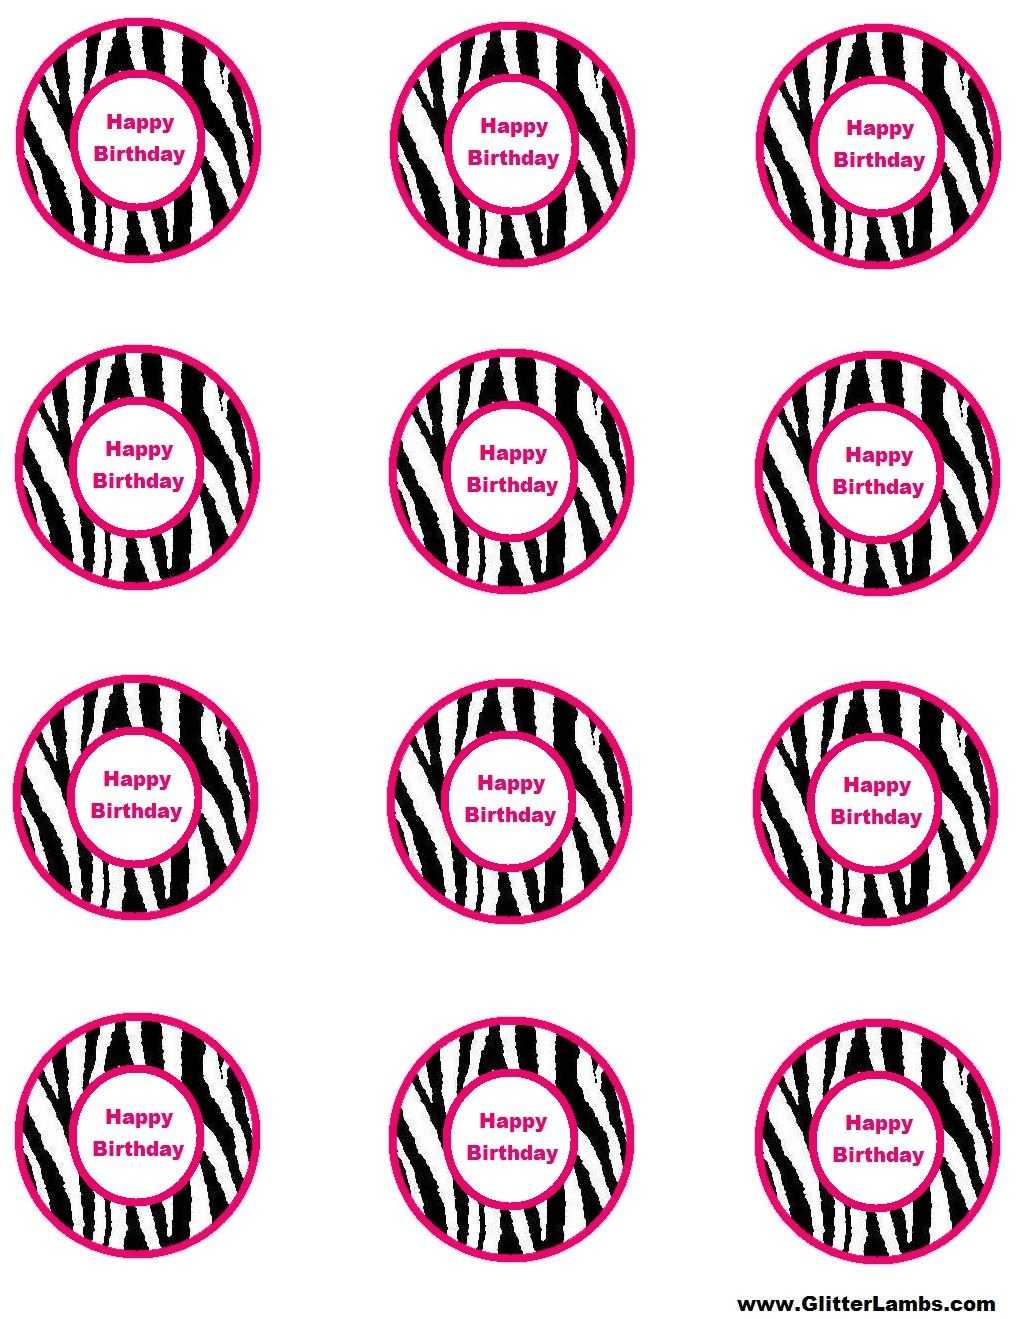 Free Pink Zebra Birthday Party Food Cards Printables & Cupcake - Free Printable Food Cards